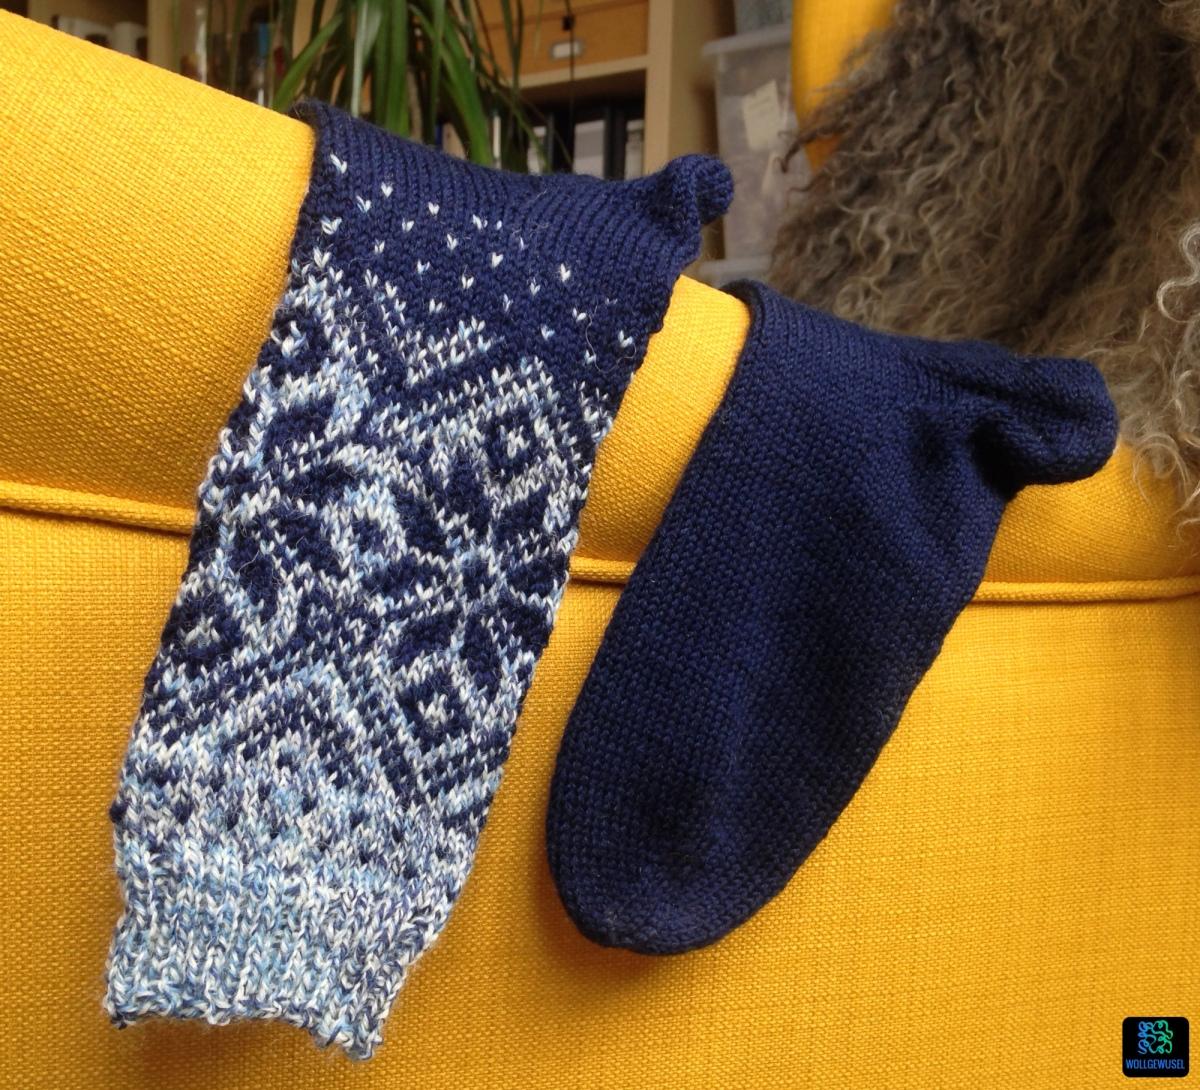 Der erste Versuch: Jacquard-Socken